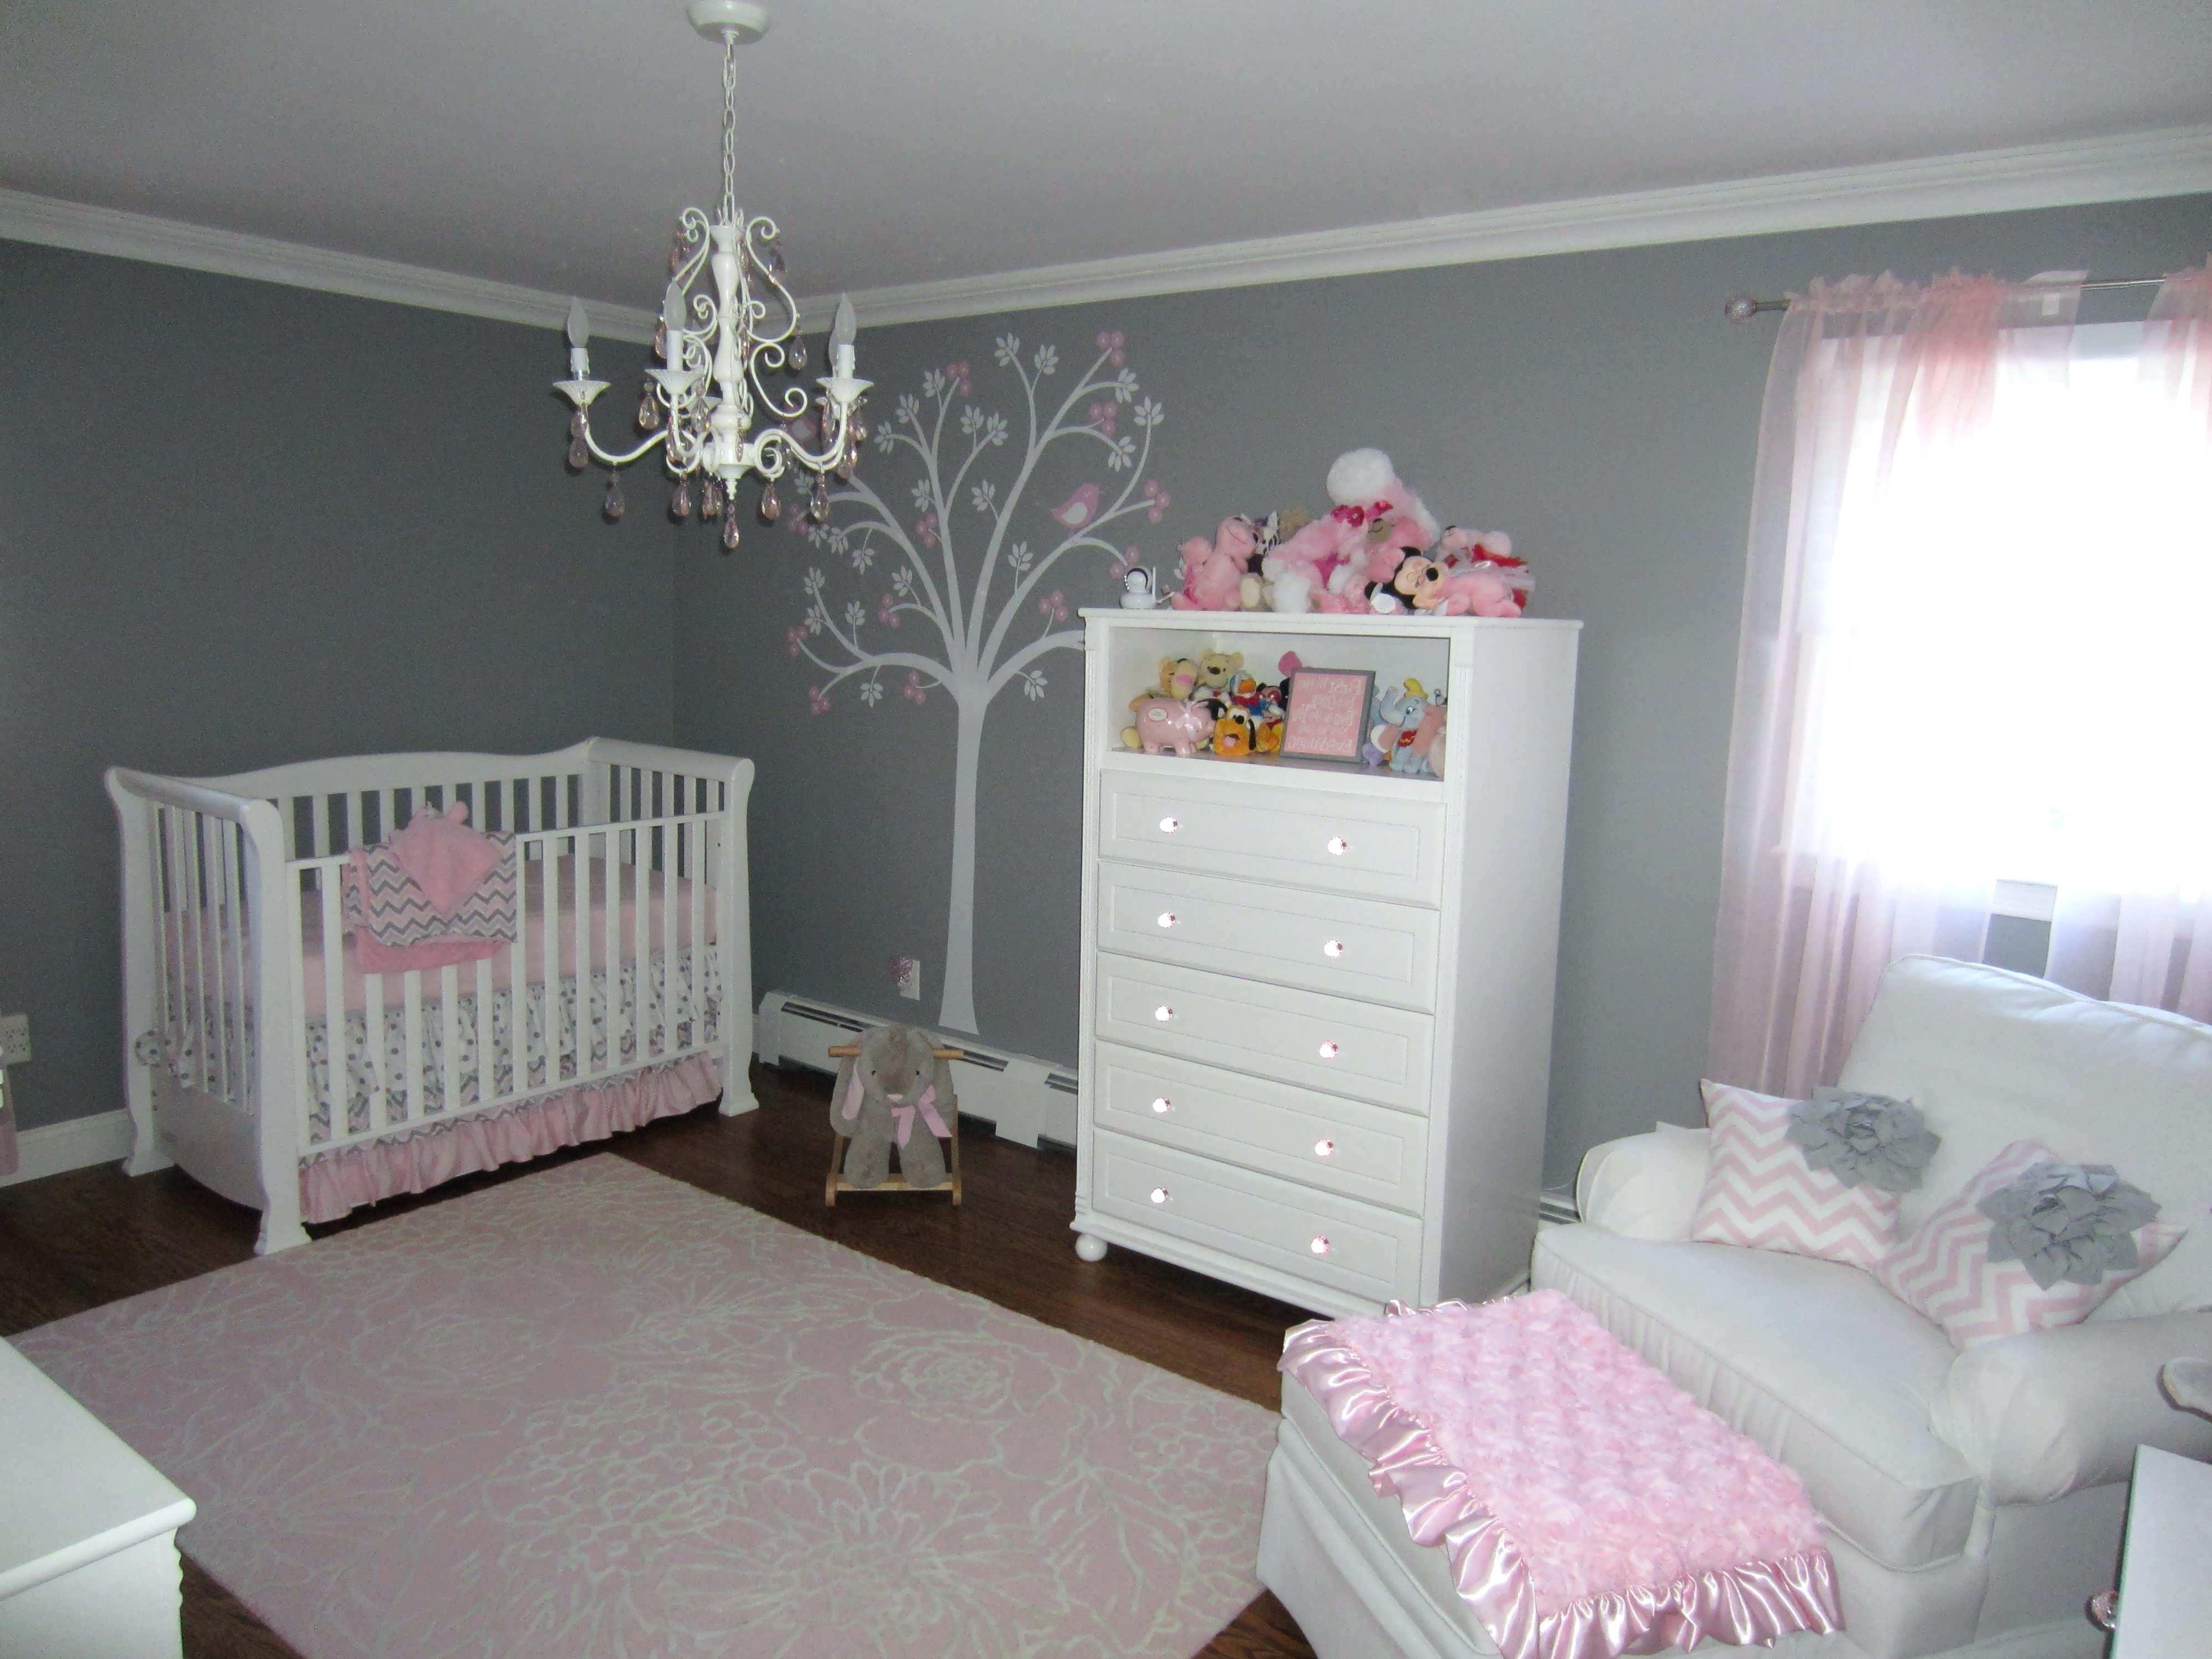 Lighting : Crystal Chandelier Baby Girl Room For Chandeliers Throughout Trendy Chandeliers For Baby Girl Room (View 18 of 20)